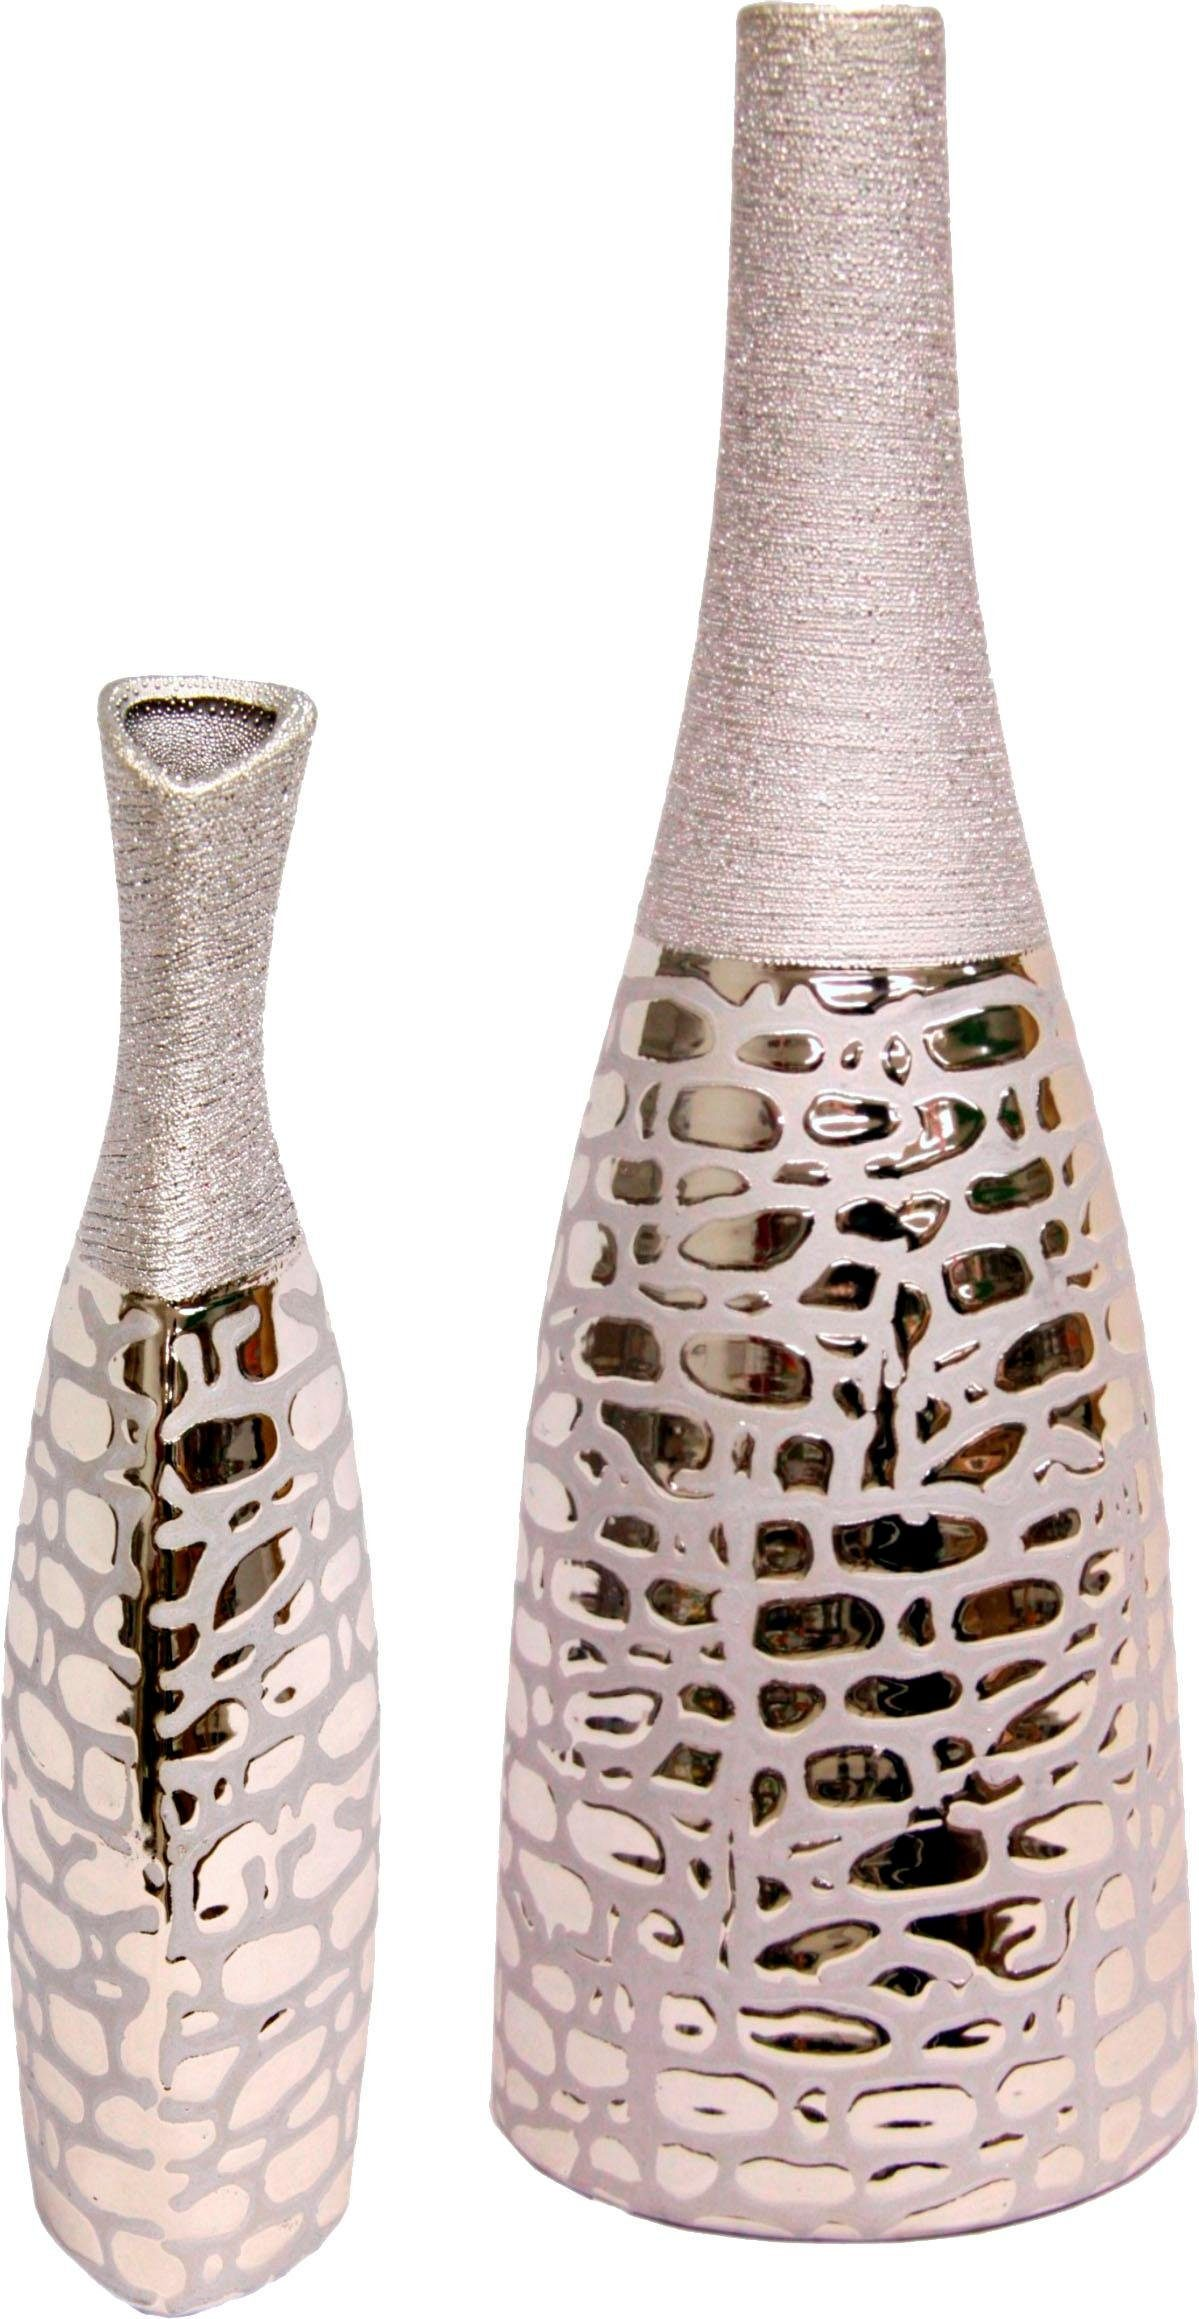 Home Affaire Keramik-Vase, Höhe 26 und 37 cm (2er Set)